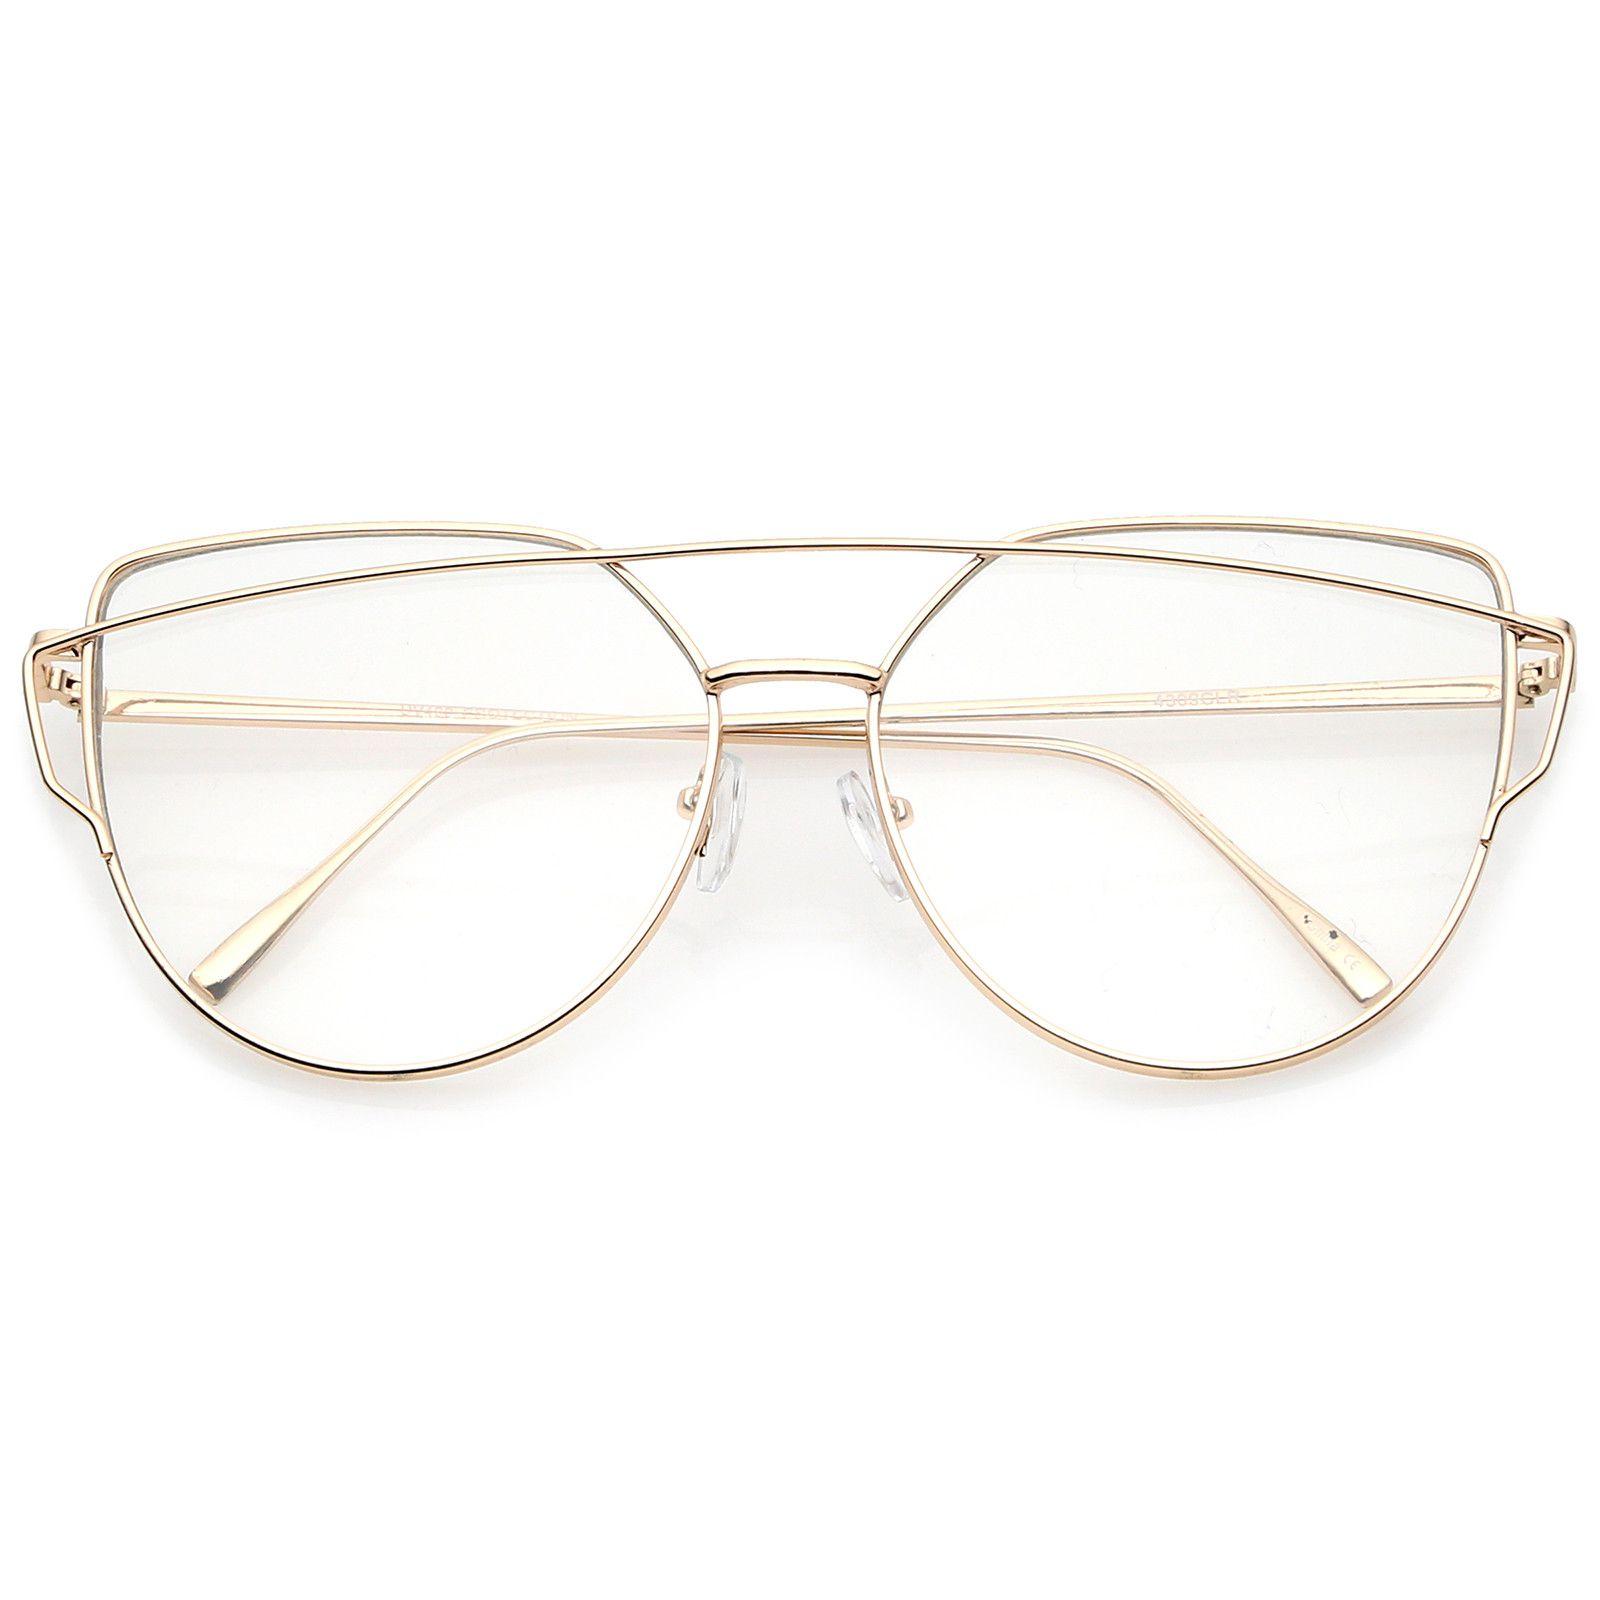 b7b50b28df Oversize Metal Frame Thin Temple Clear Flat Lens Aviator Eyeglasses 62mm   frame  clear  womens  purple  mirrored  sunglasses  sunglass  summer   sunglassla   ...